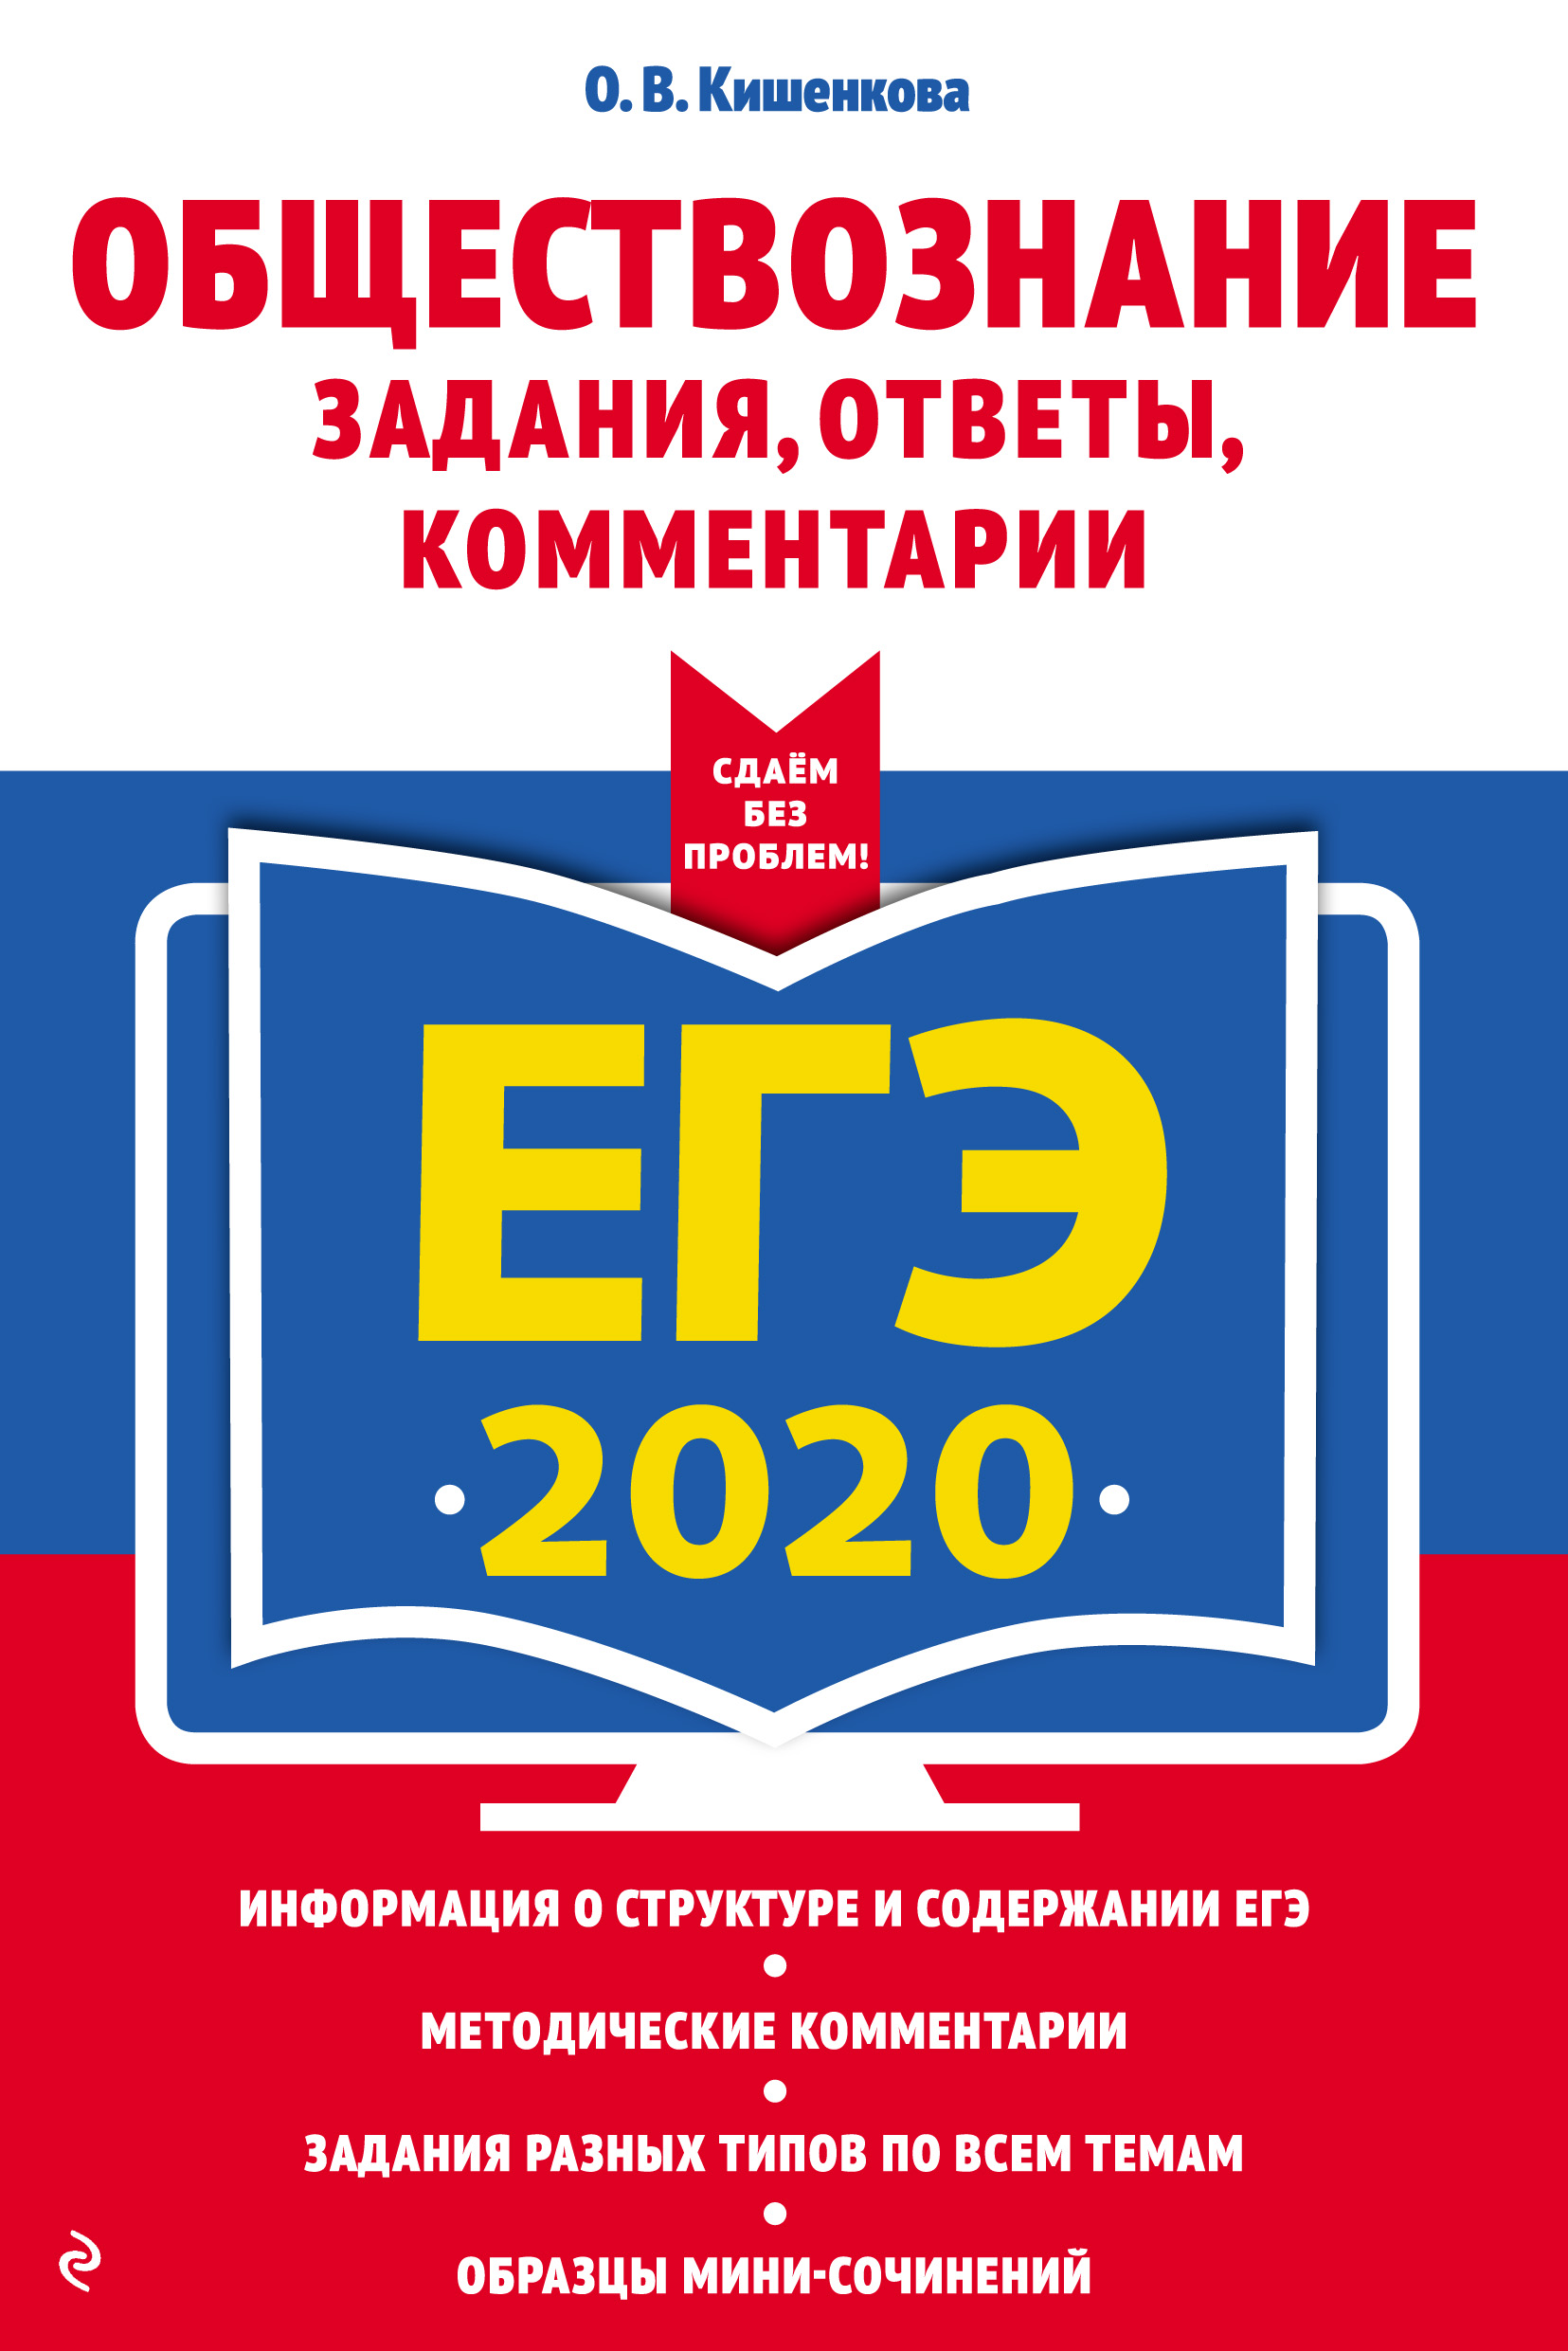 цена на О. В. Кишенкова ЕГЭ-2020. Обществознание. Задания, ответы, комментарии